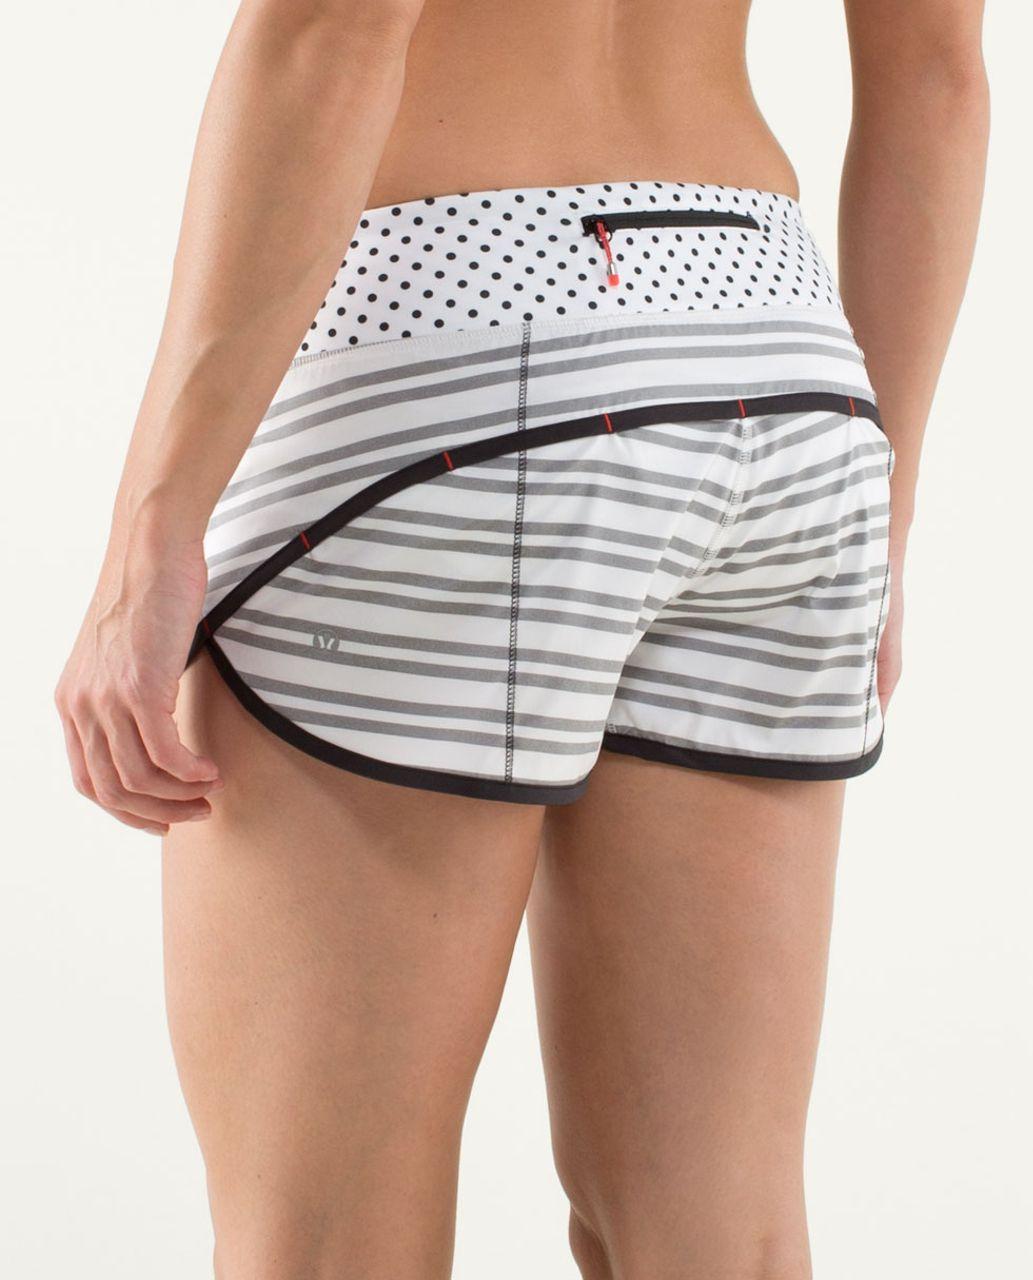 Lululemon Run:  Speed Short - Twin Stripe Black / Black / Mod Dot Printed Black